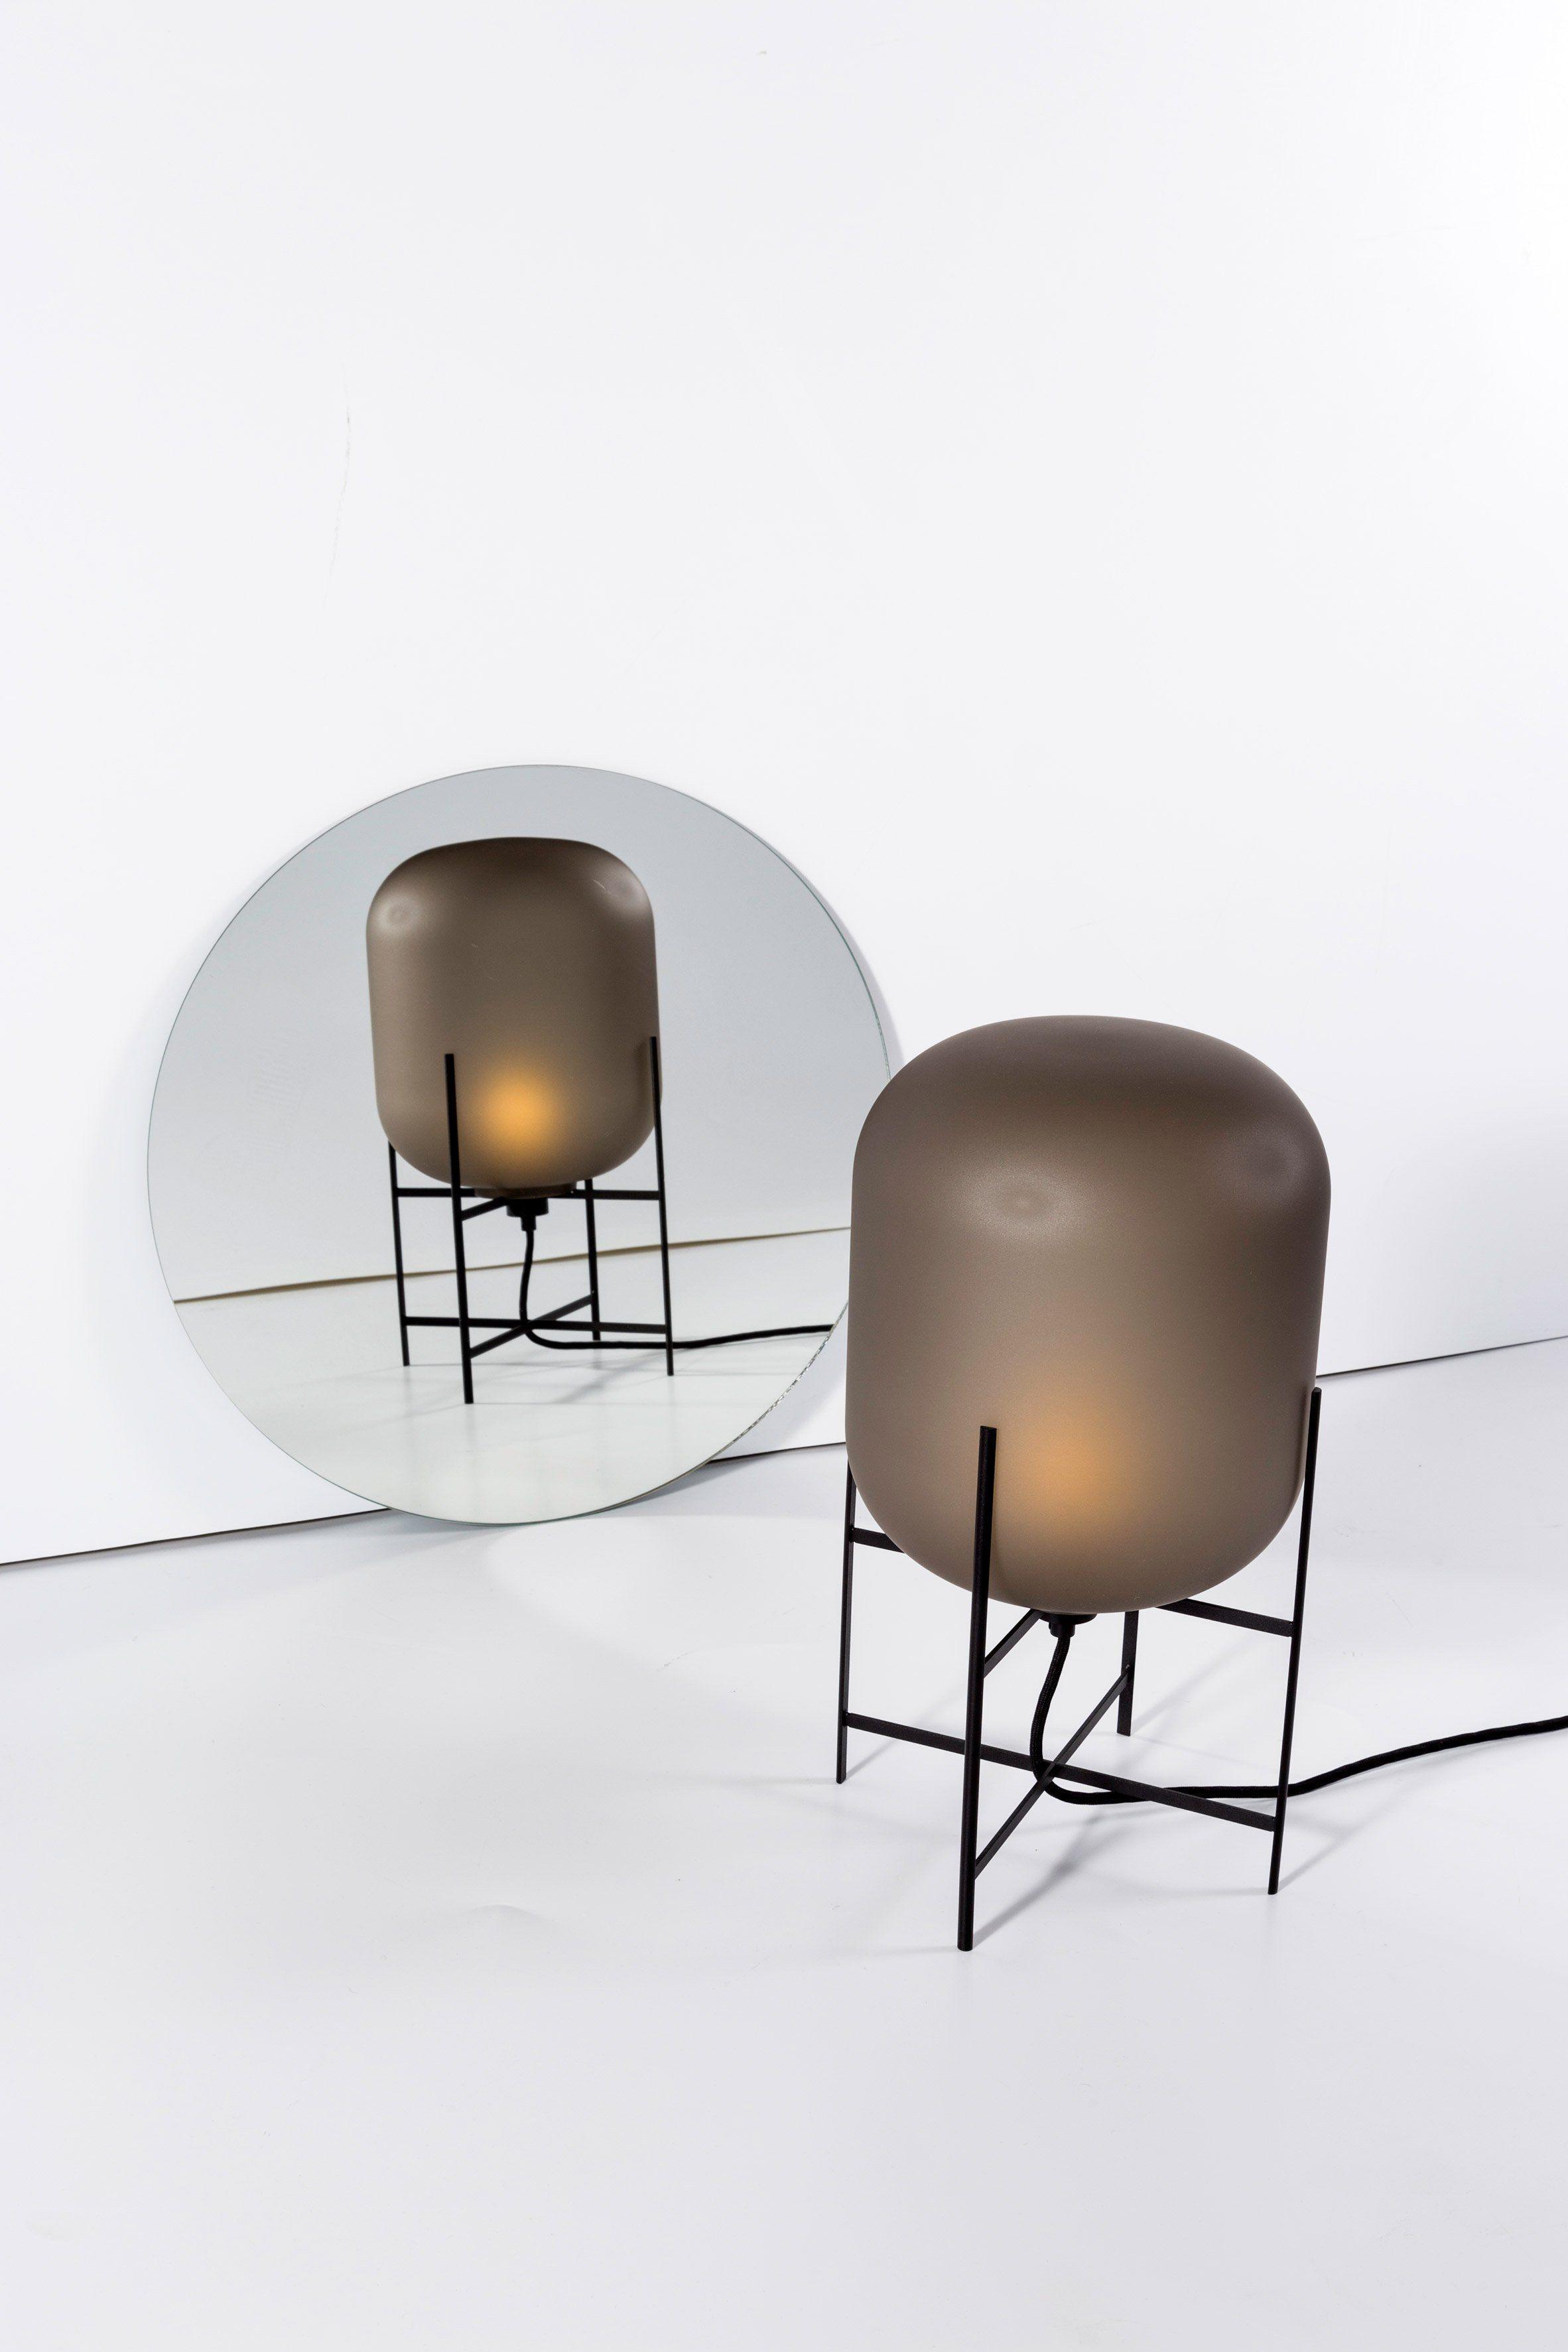 Dezeen Has Teamed Up With German Design Studio Pulpo And Long Term Collaborator Sebastian Herkner To Give Away Versions Of The Oda Lamp Lamp Lamp Design Design